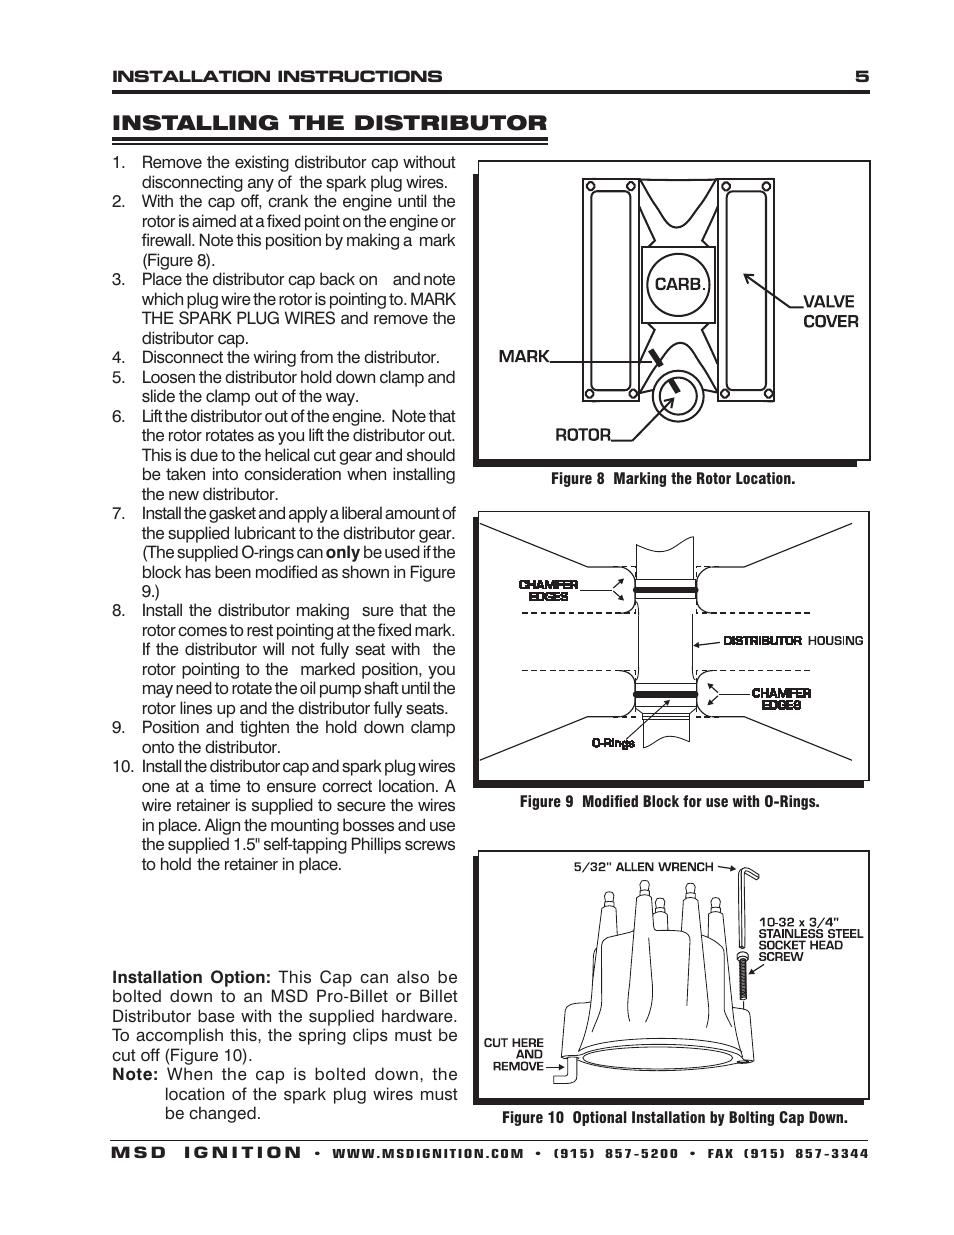 medium resolution of msd 8361 wiring diagram wiring library optispark wiring diagram msd 8361 chevy v8 street pro billet